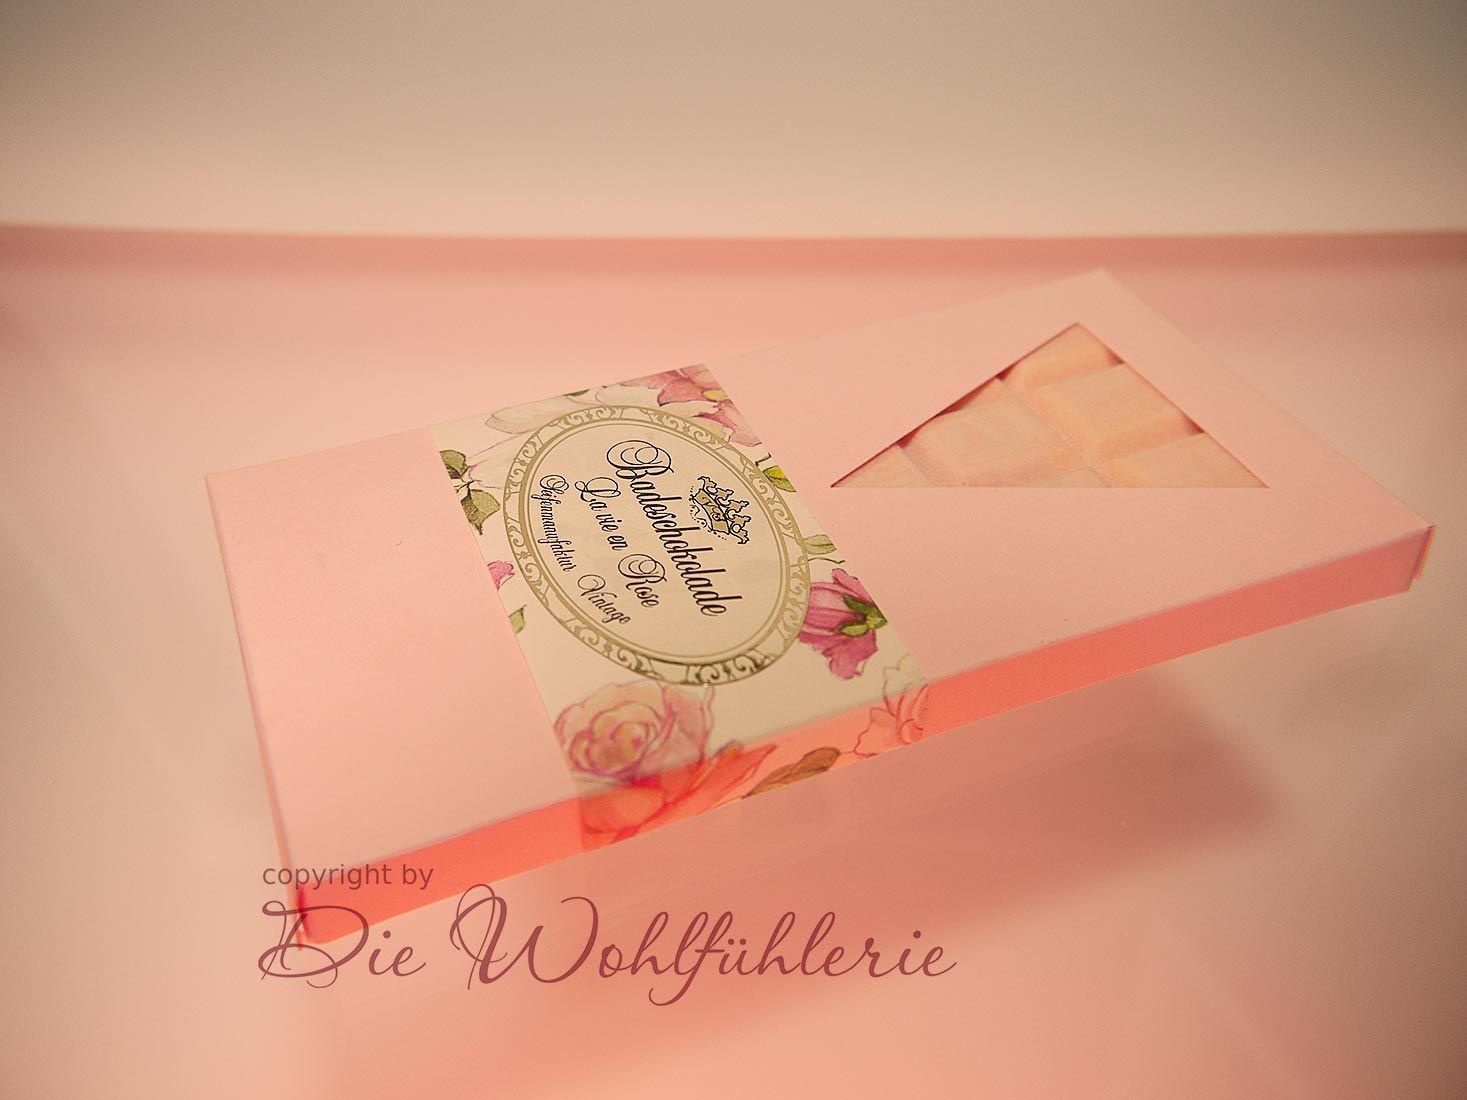 La Vie en Rose - Badeschokolade Rose. So weiblich, so duftend - einfach perfekt!